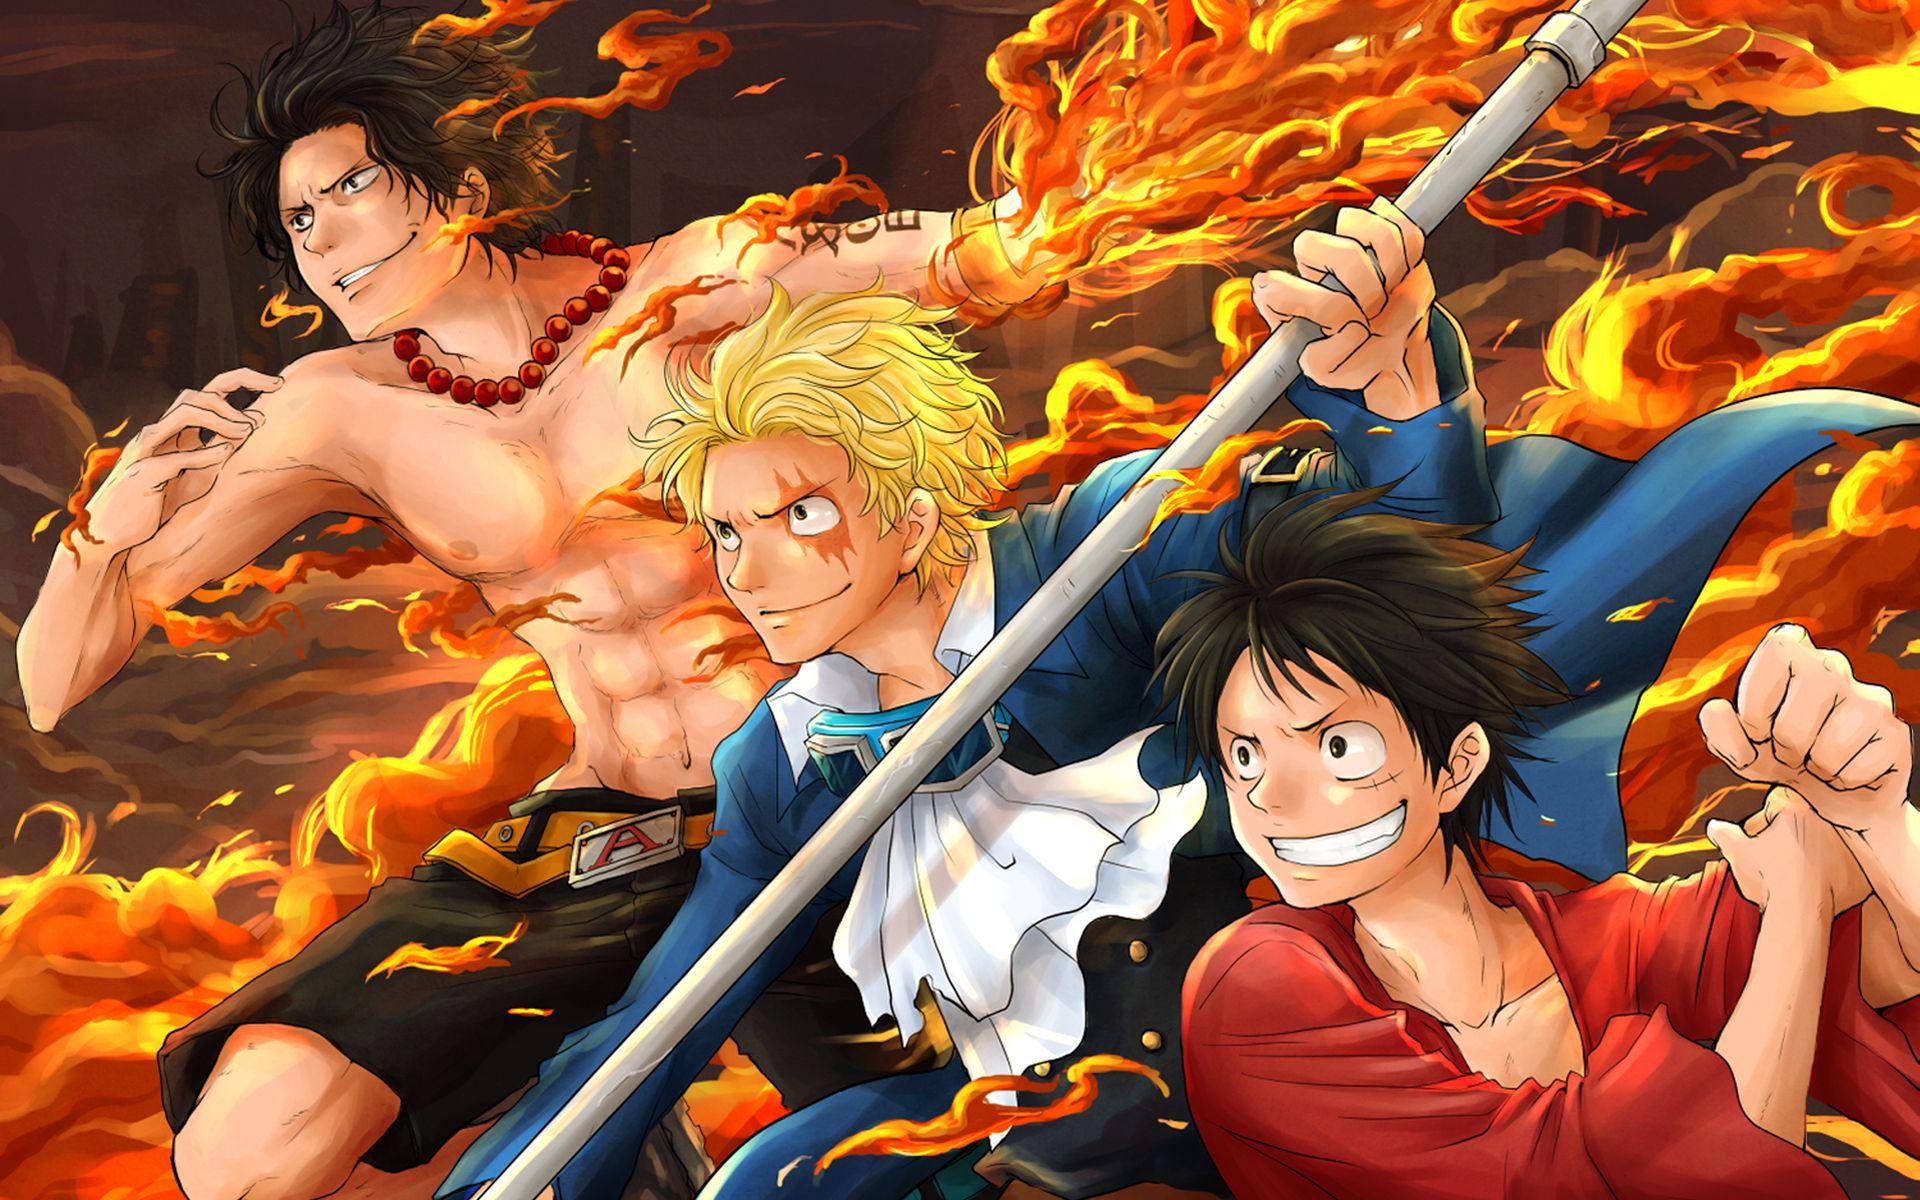 Anime One Piece Sabo Monkey D. Luffy Portgas D. Ace